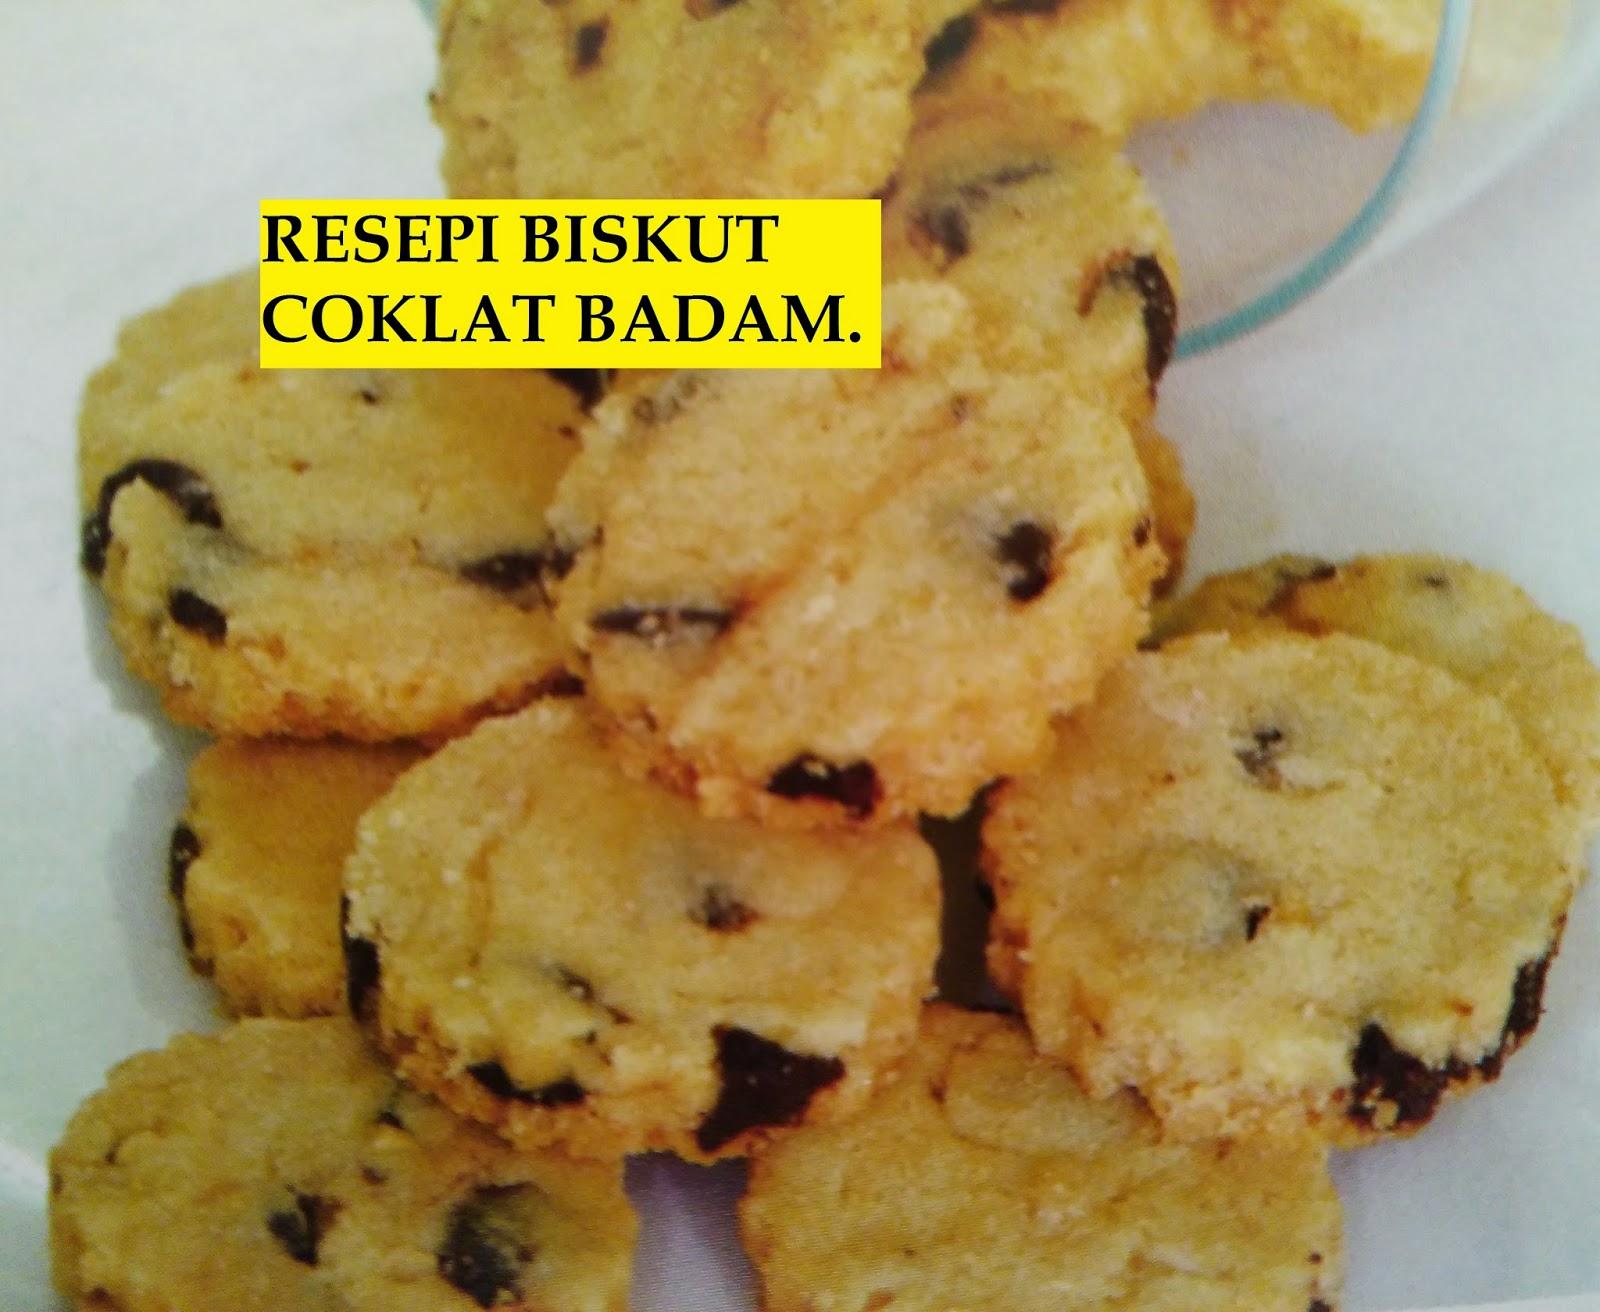 Resepi, Biskut Coklat Badam